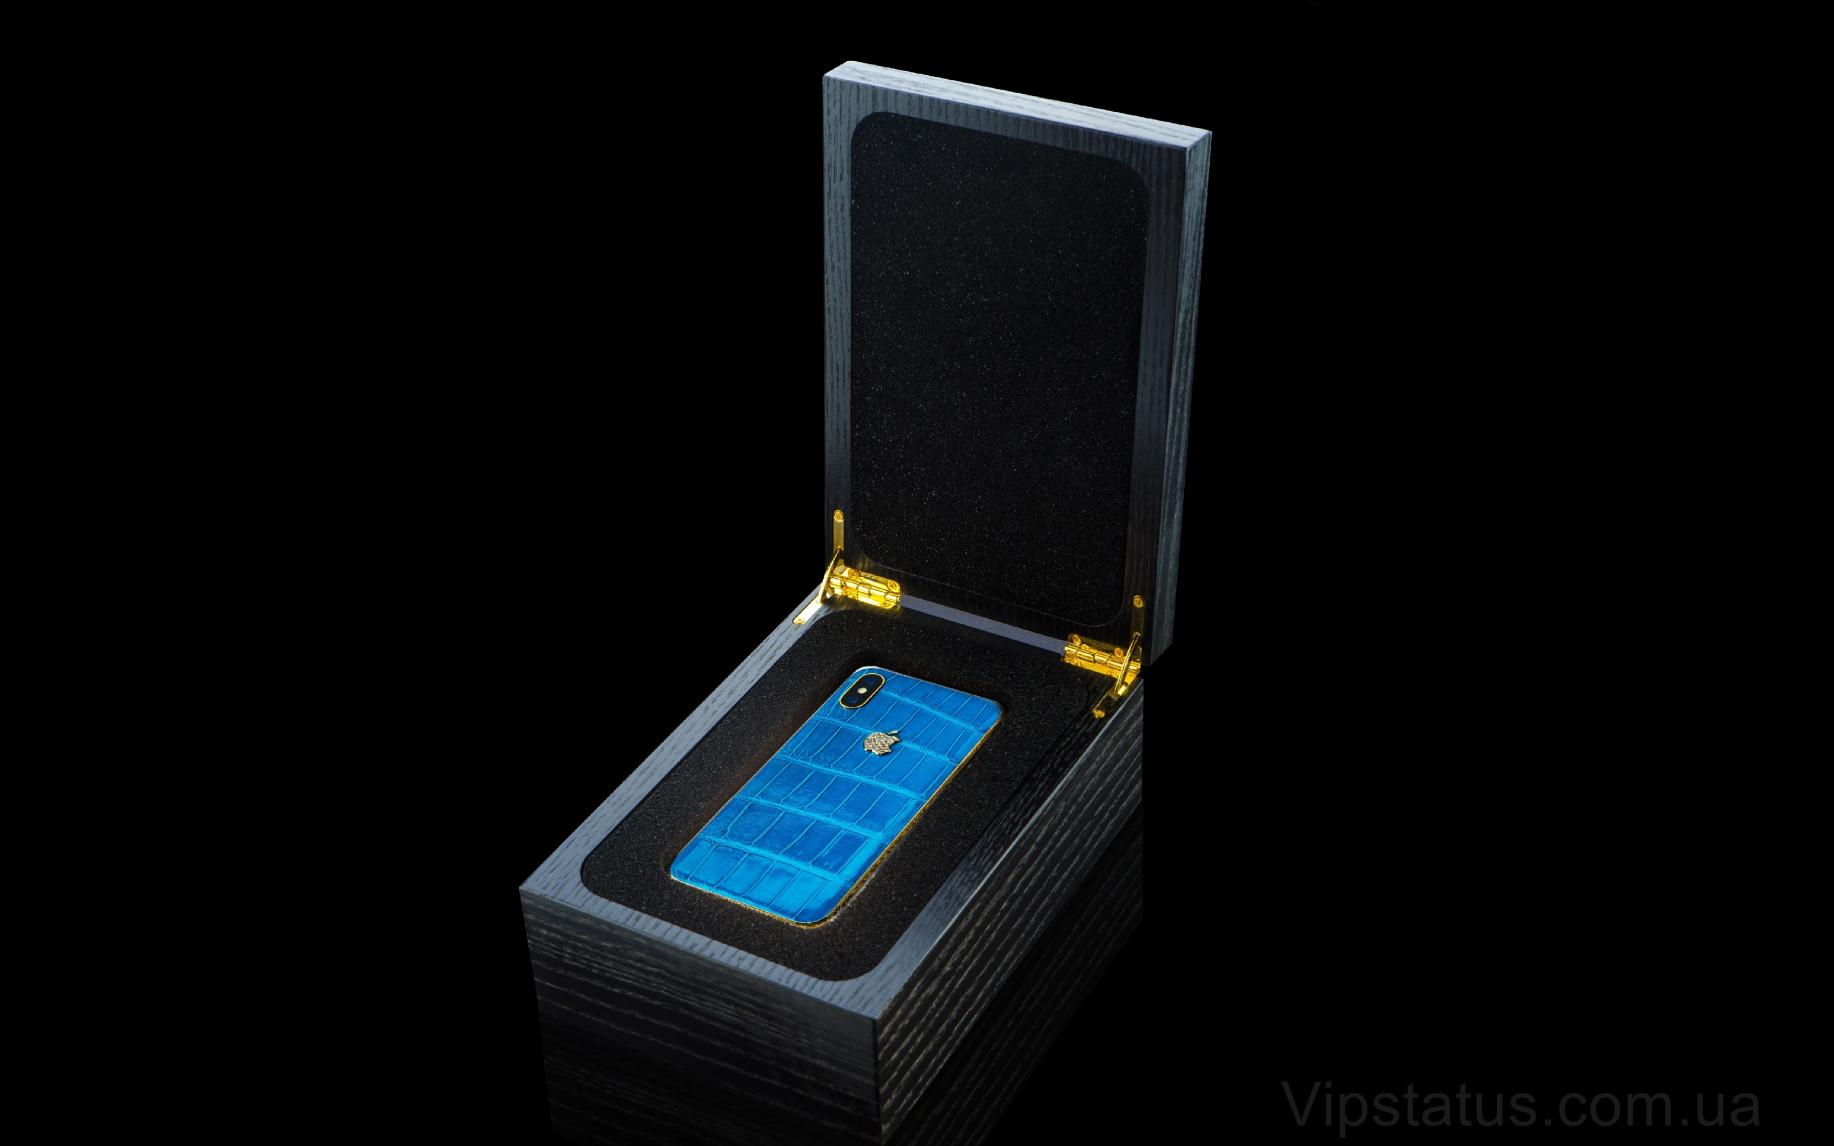 Elite Queen Diamond IPHONE XS 512 GB Queen Diamond IPHONE XS 512 GB image 7